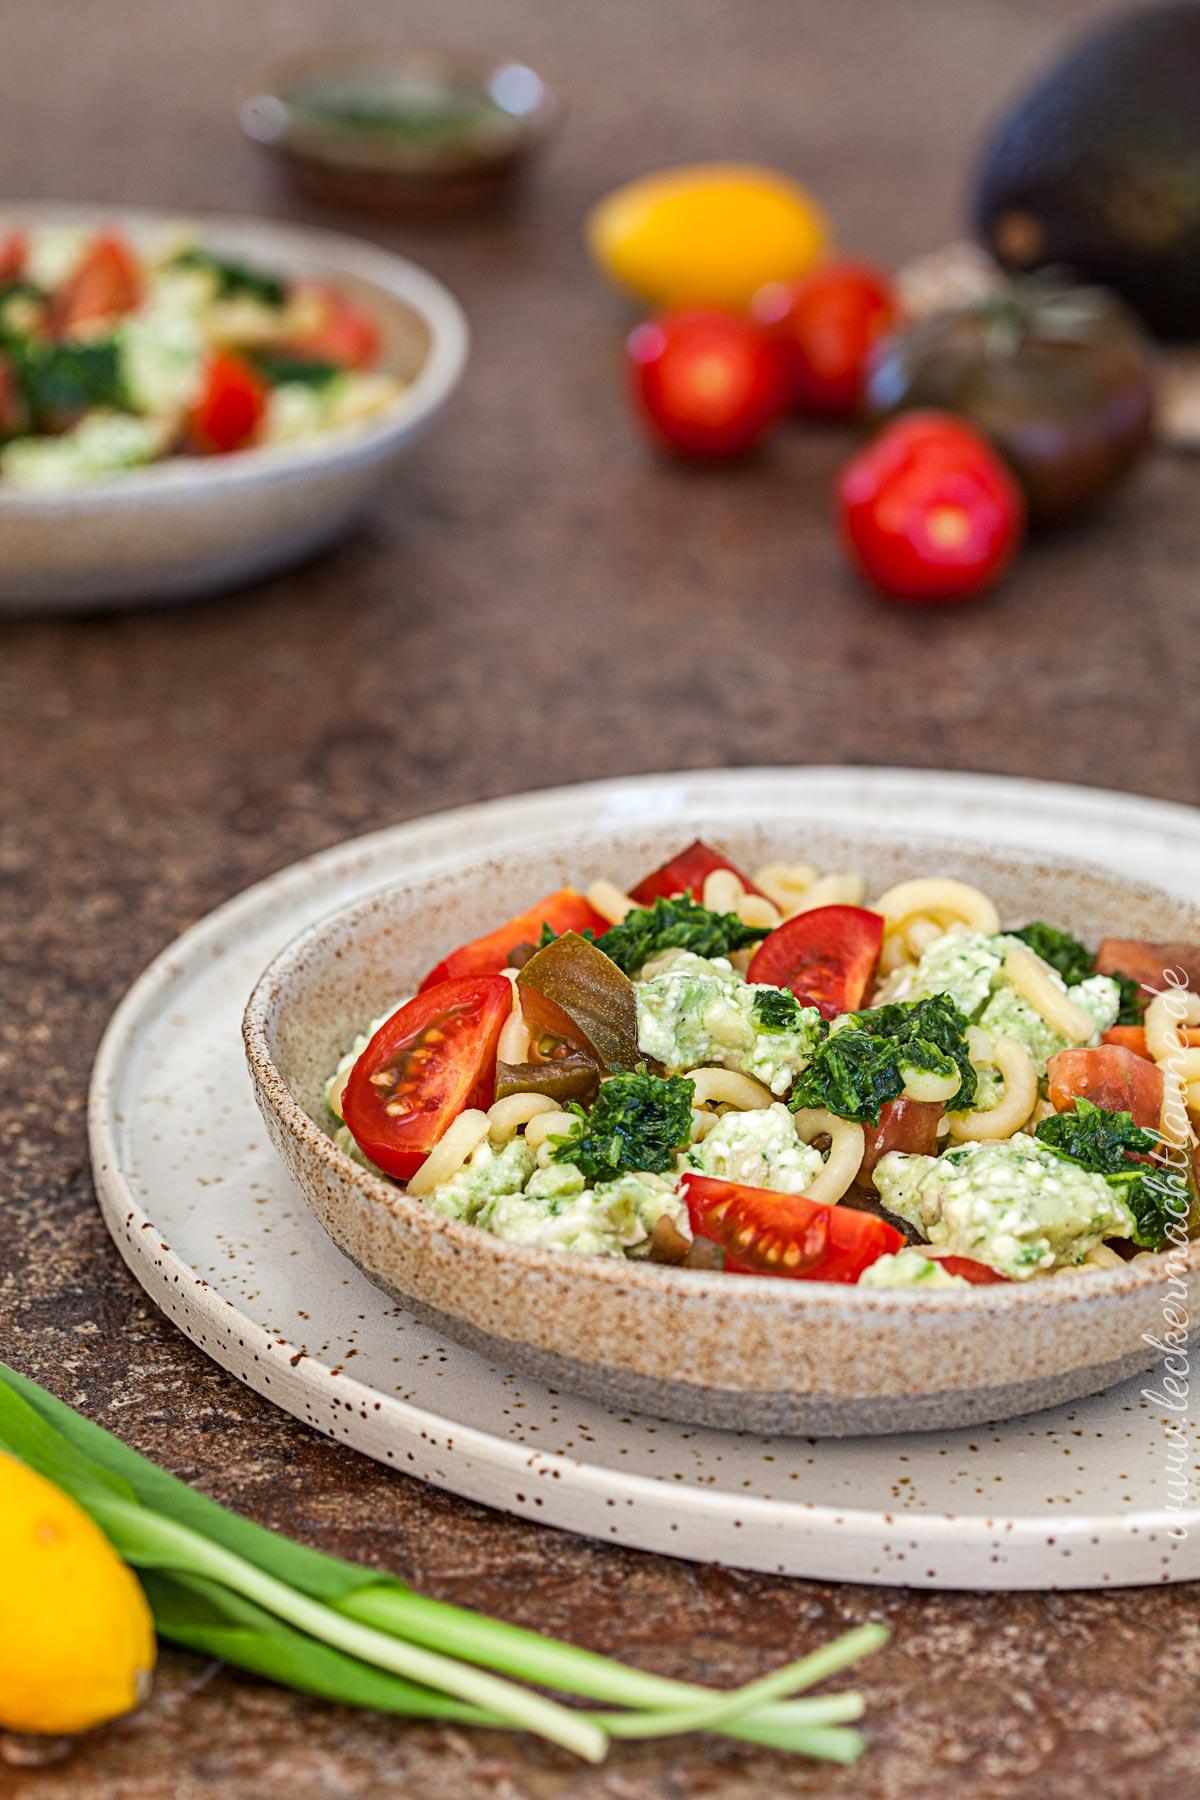 Bärlauch-Nudel-Salat {bärlauchsaison} | lecker macht laune